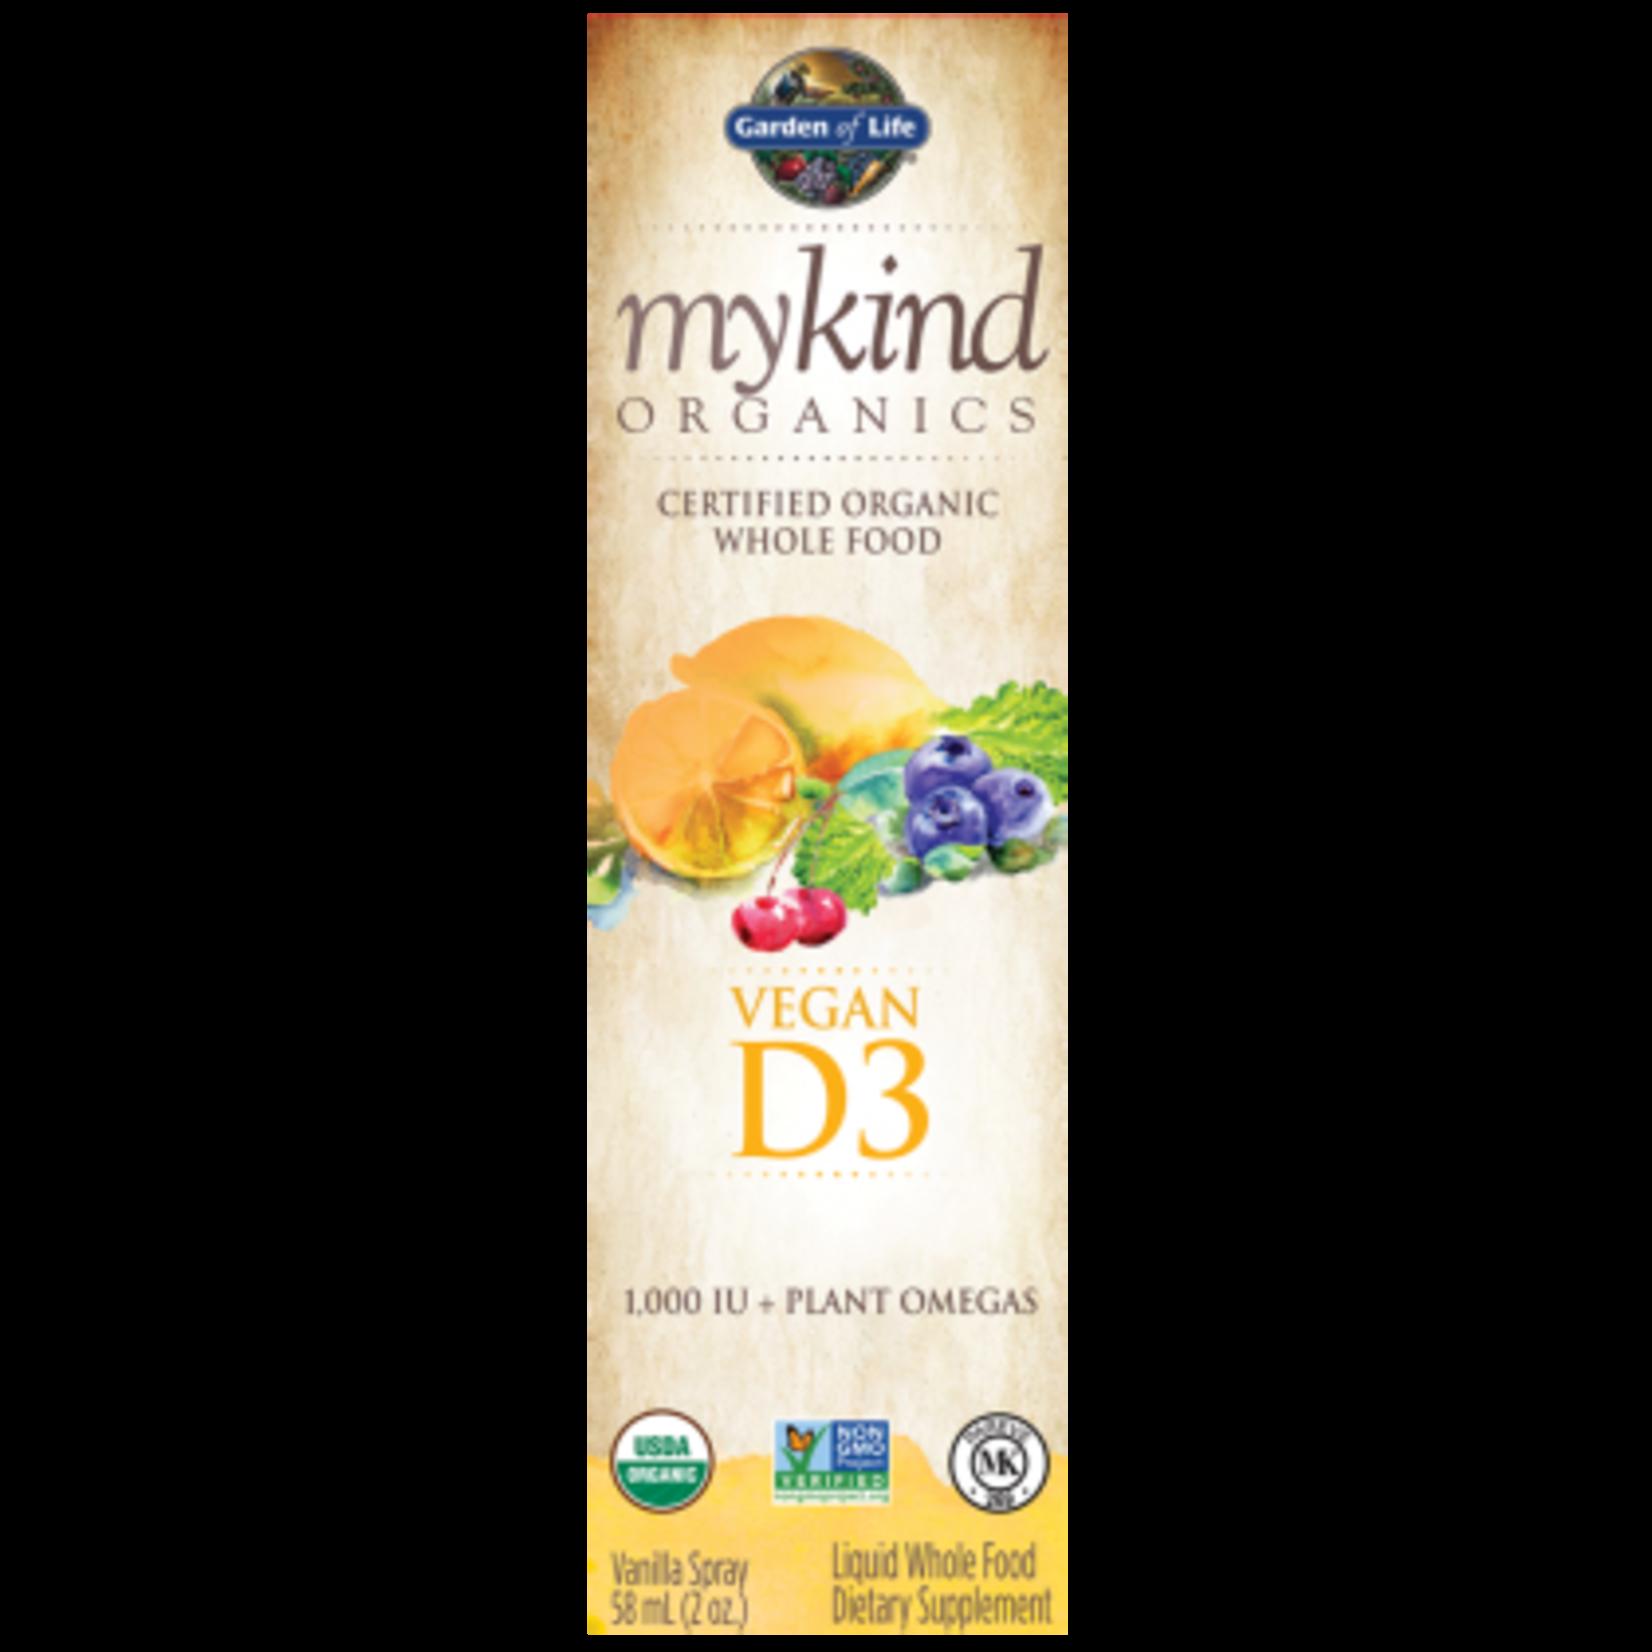 Garden Of Life My Kind Organics Vegan D3 Organic Spray 58ml